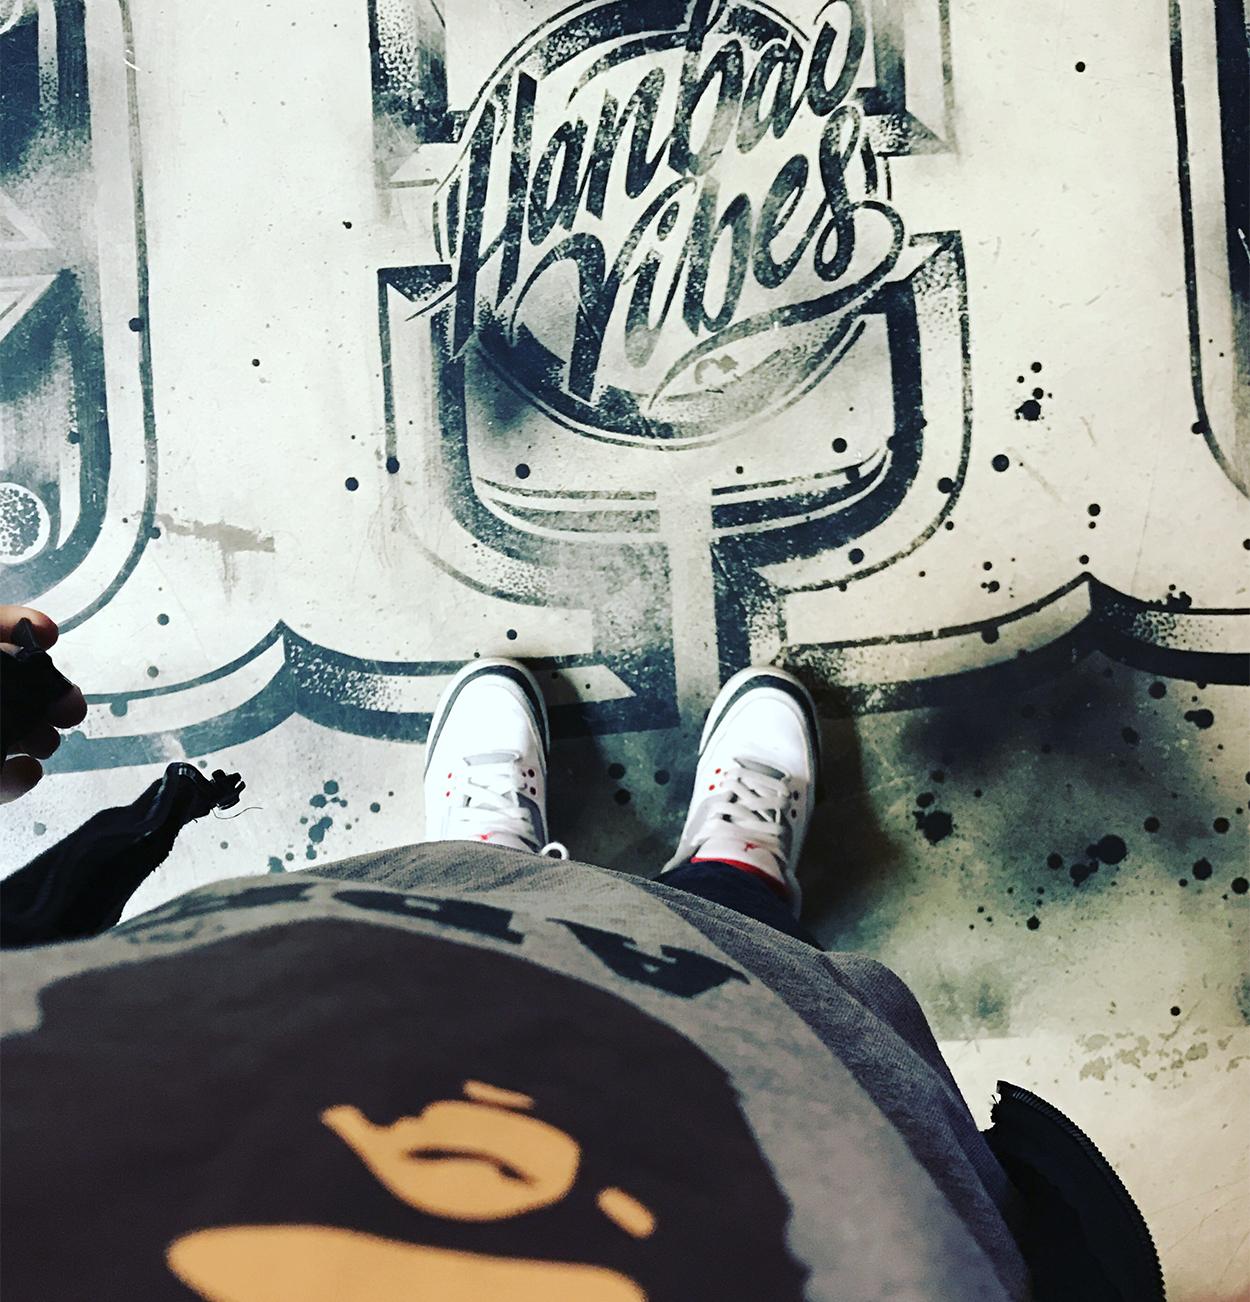 Hanbao Vibes - Graffiti Floor